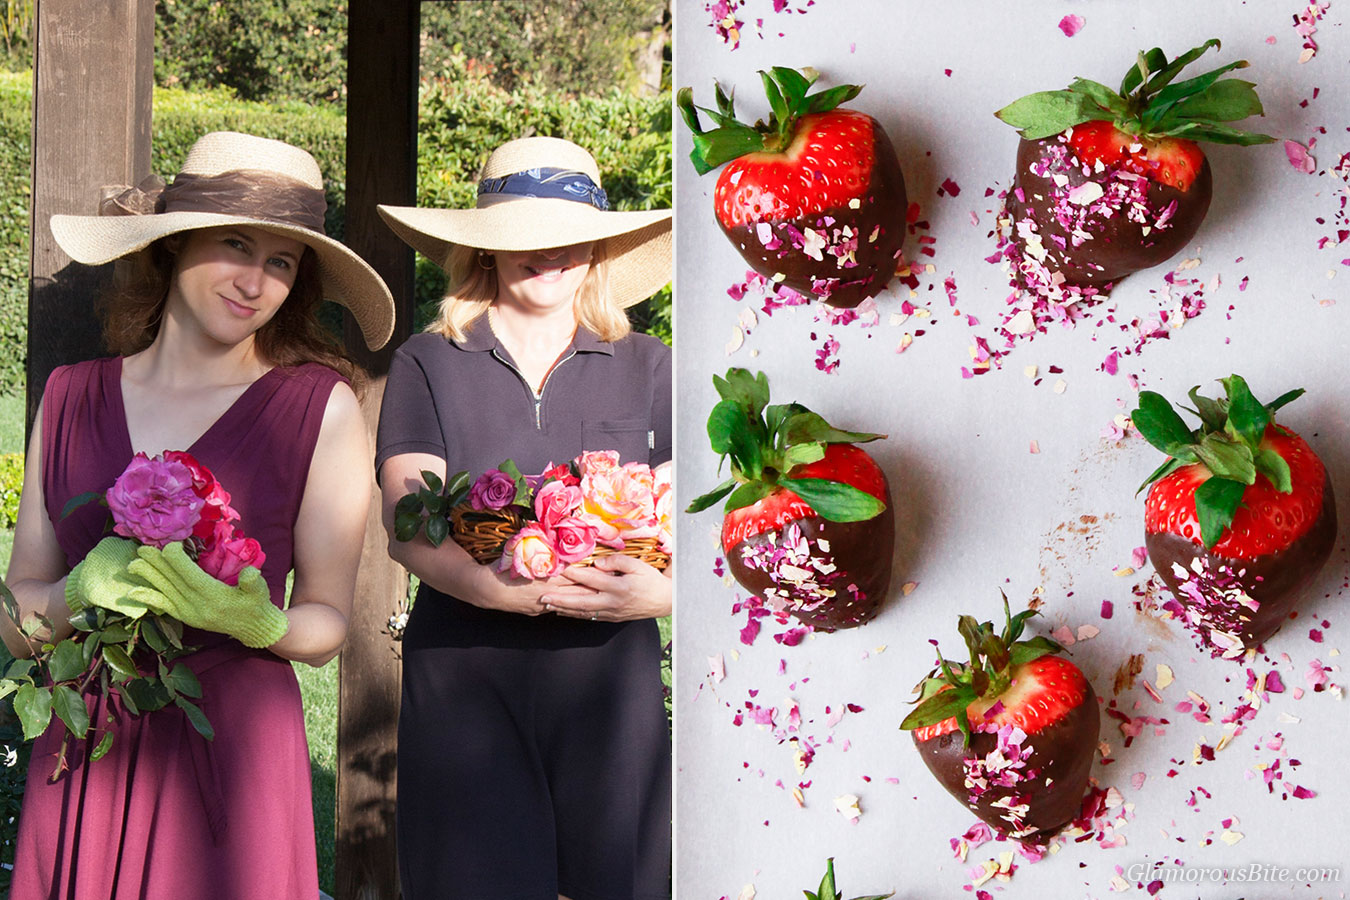 Corina and Judit Chocolate Strawberries and roses